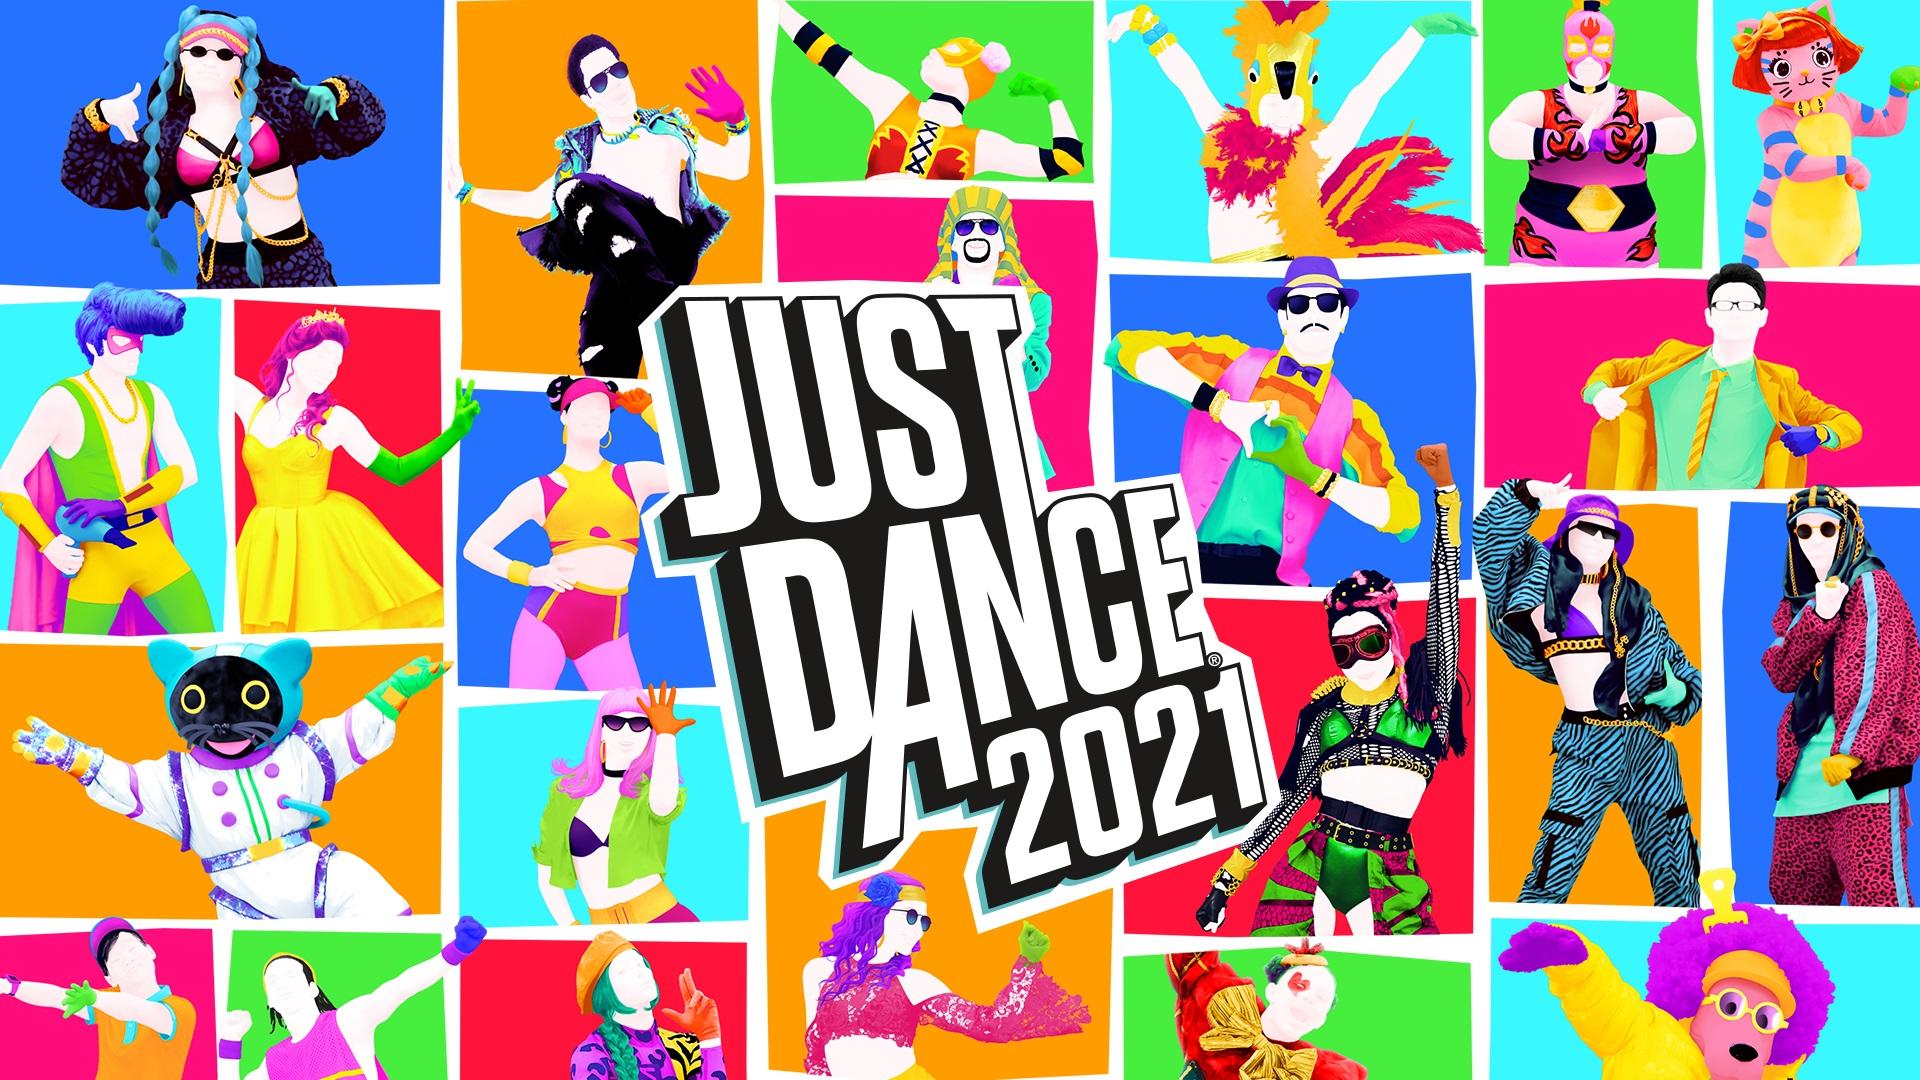 [DIGITAL] Just Dance 2021 for Nintendo Switch $29.99